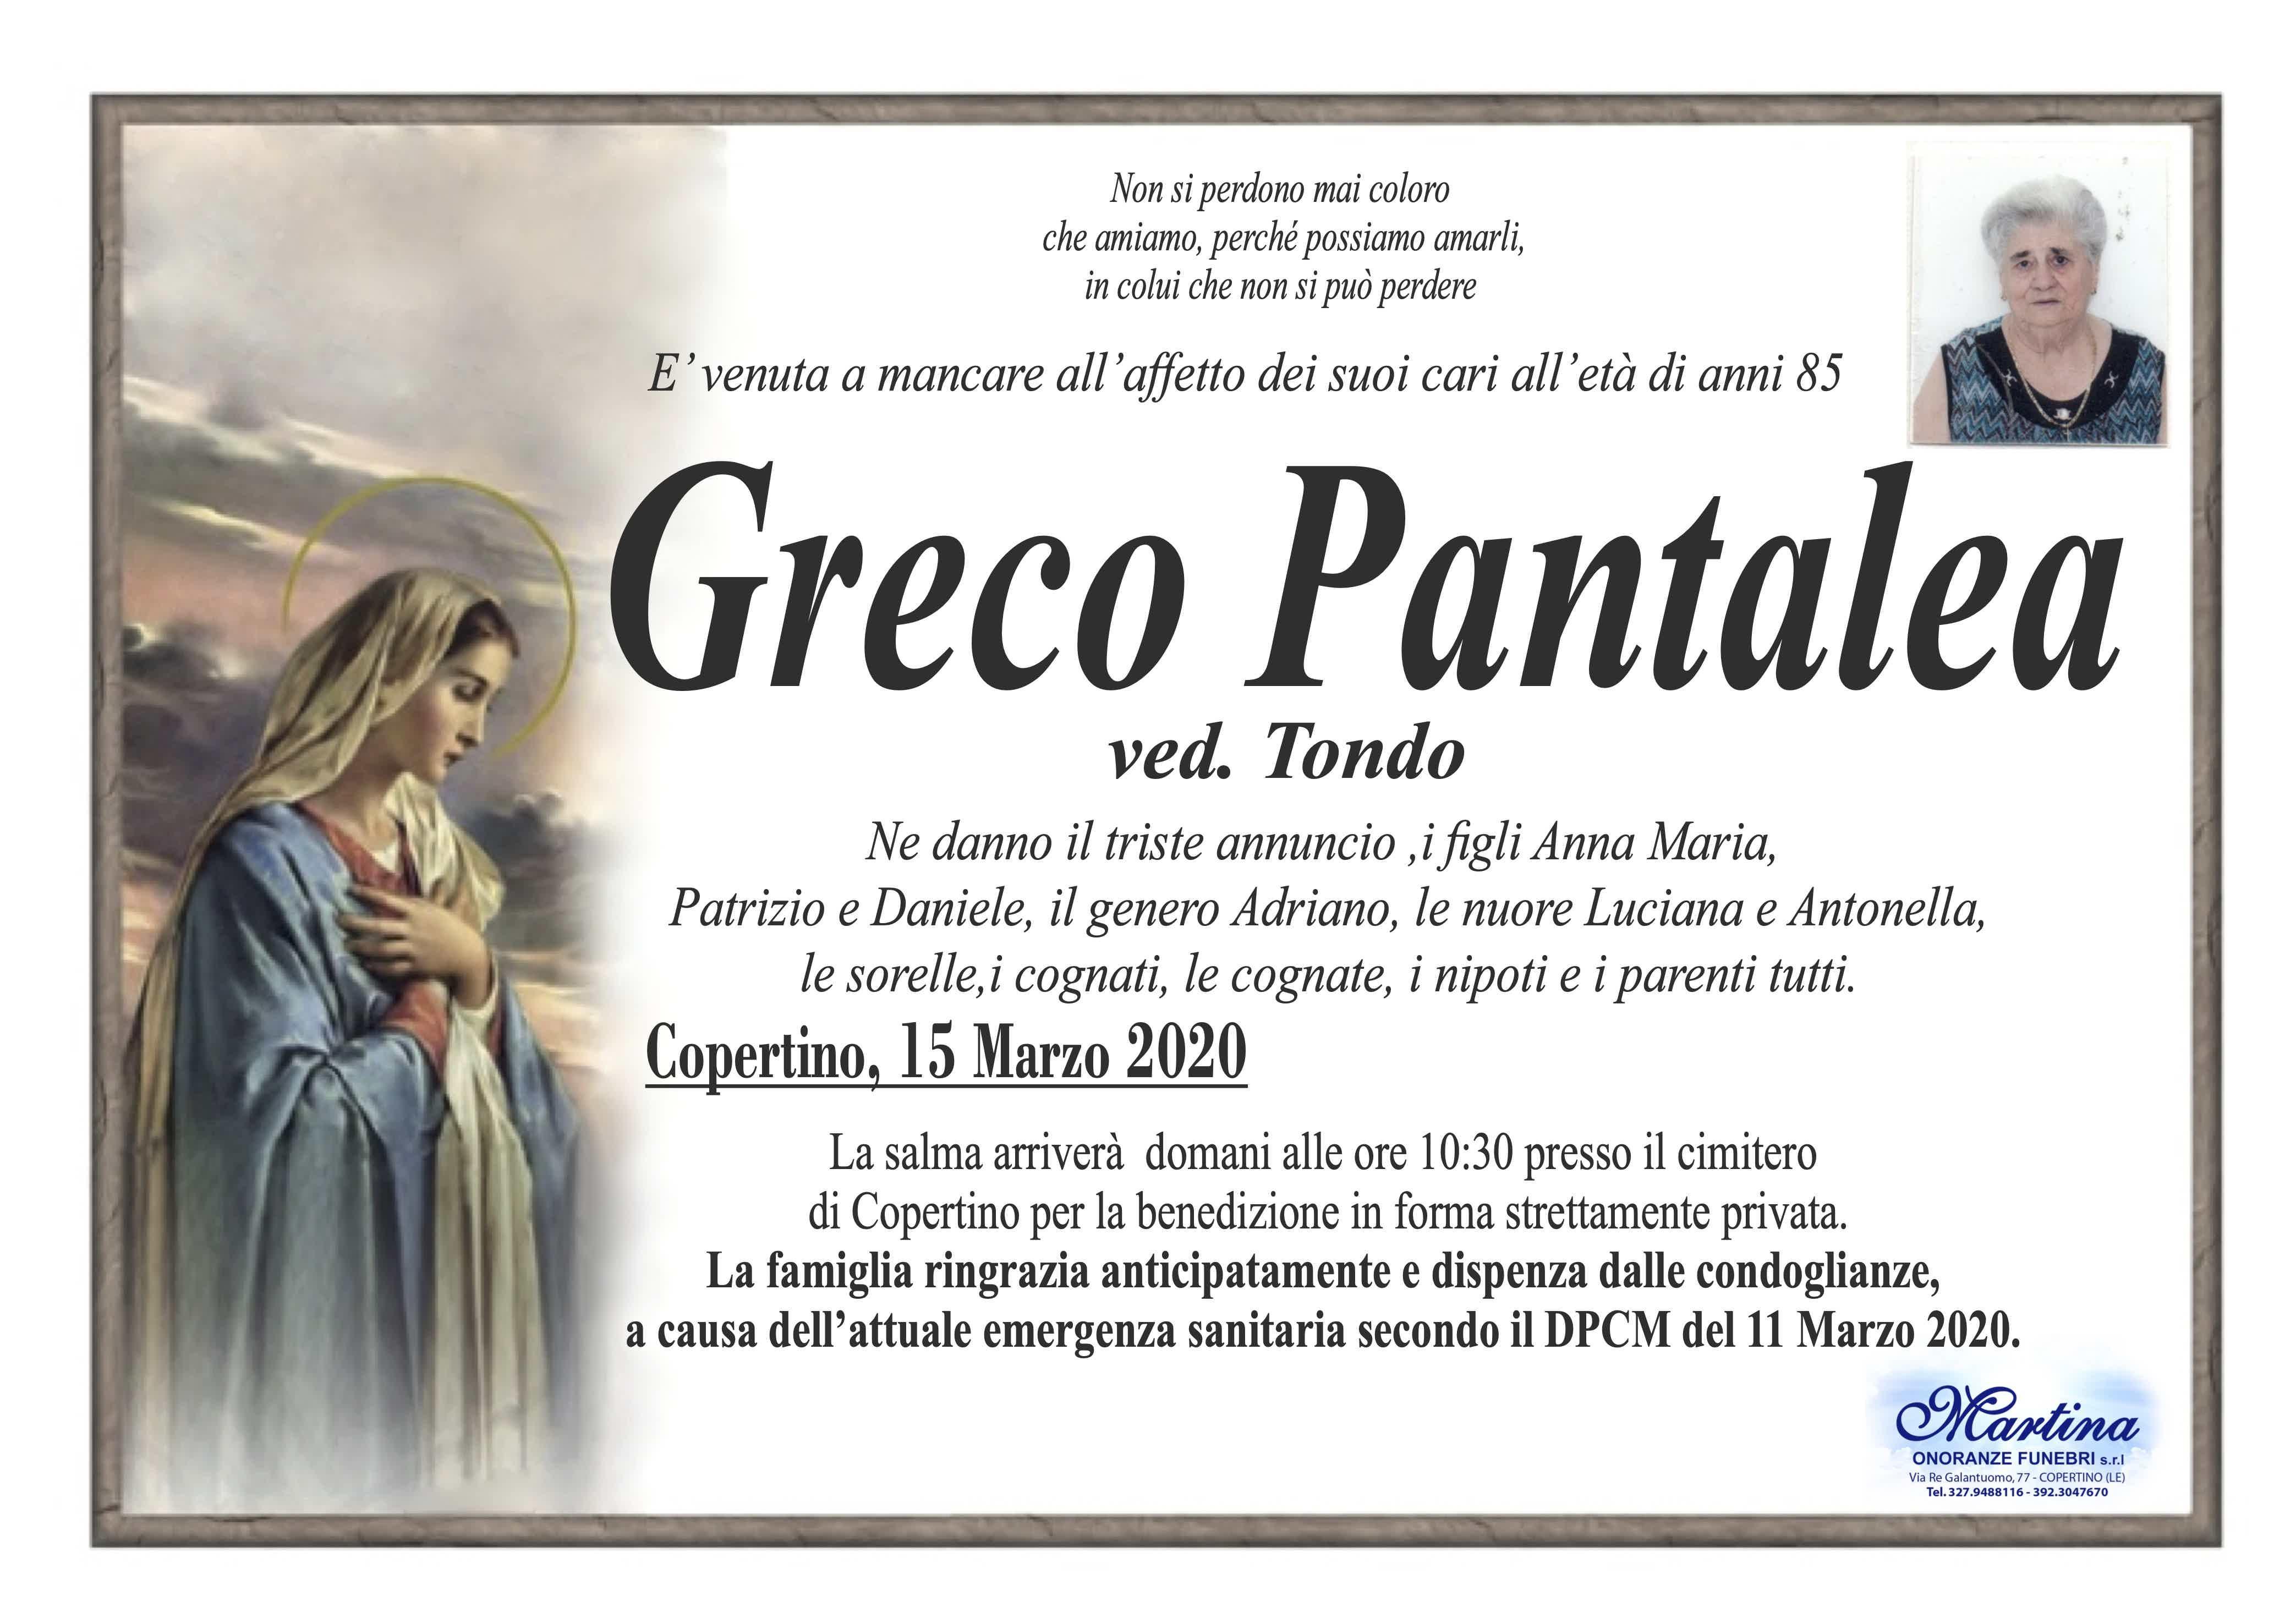 Pantalea Greco